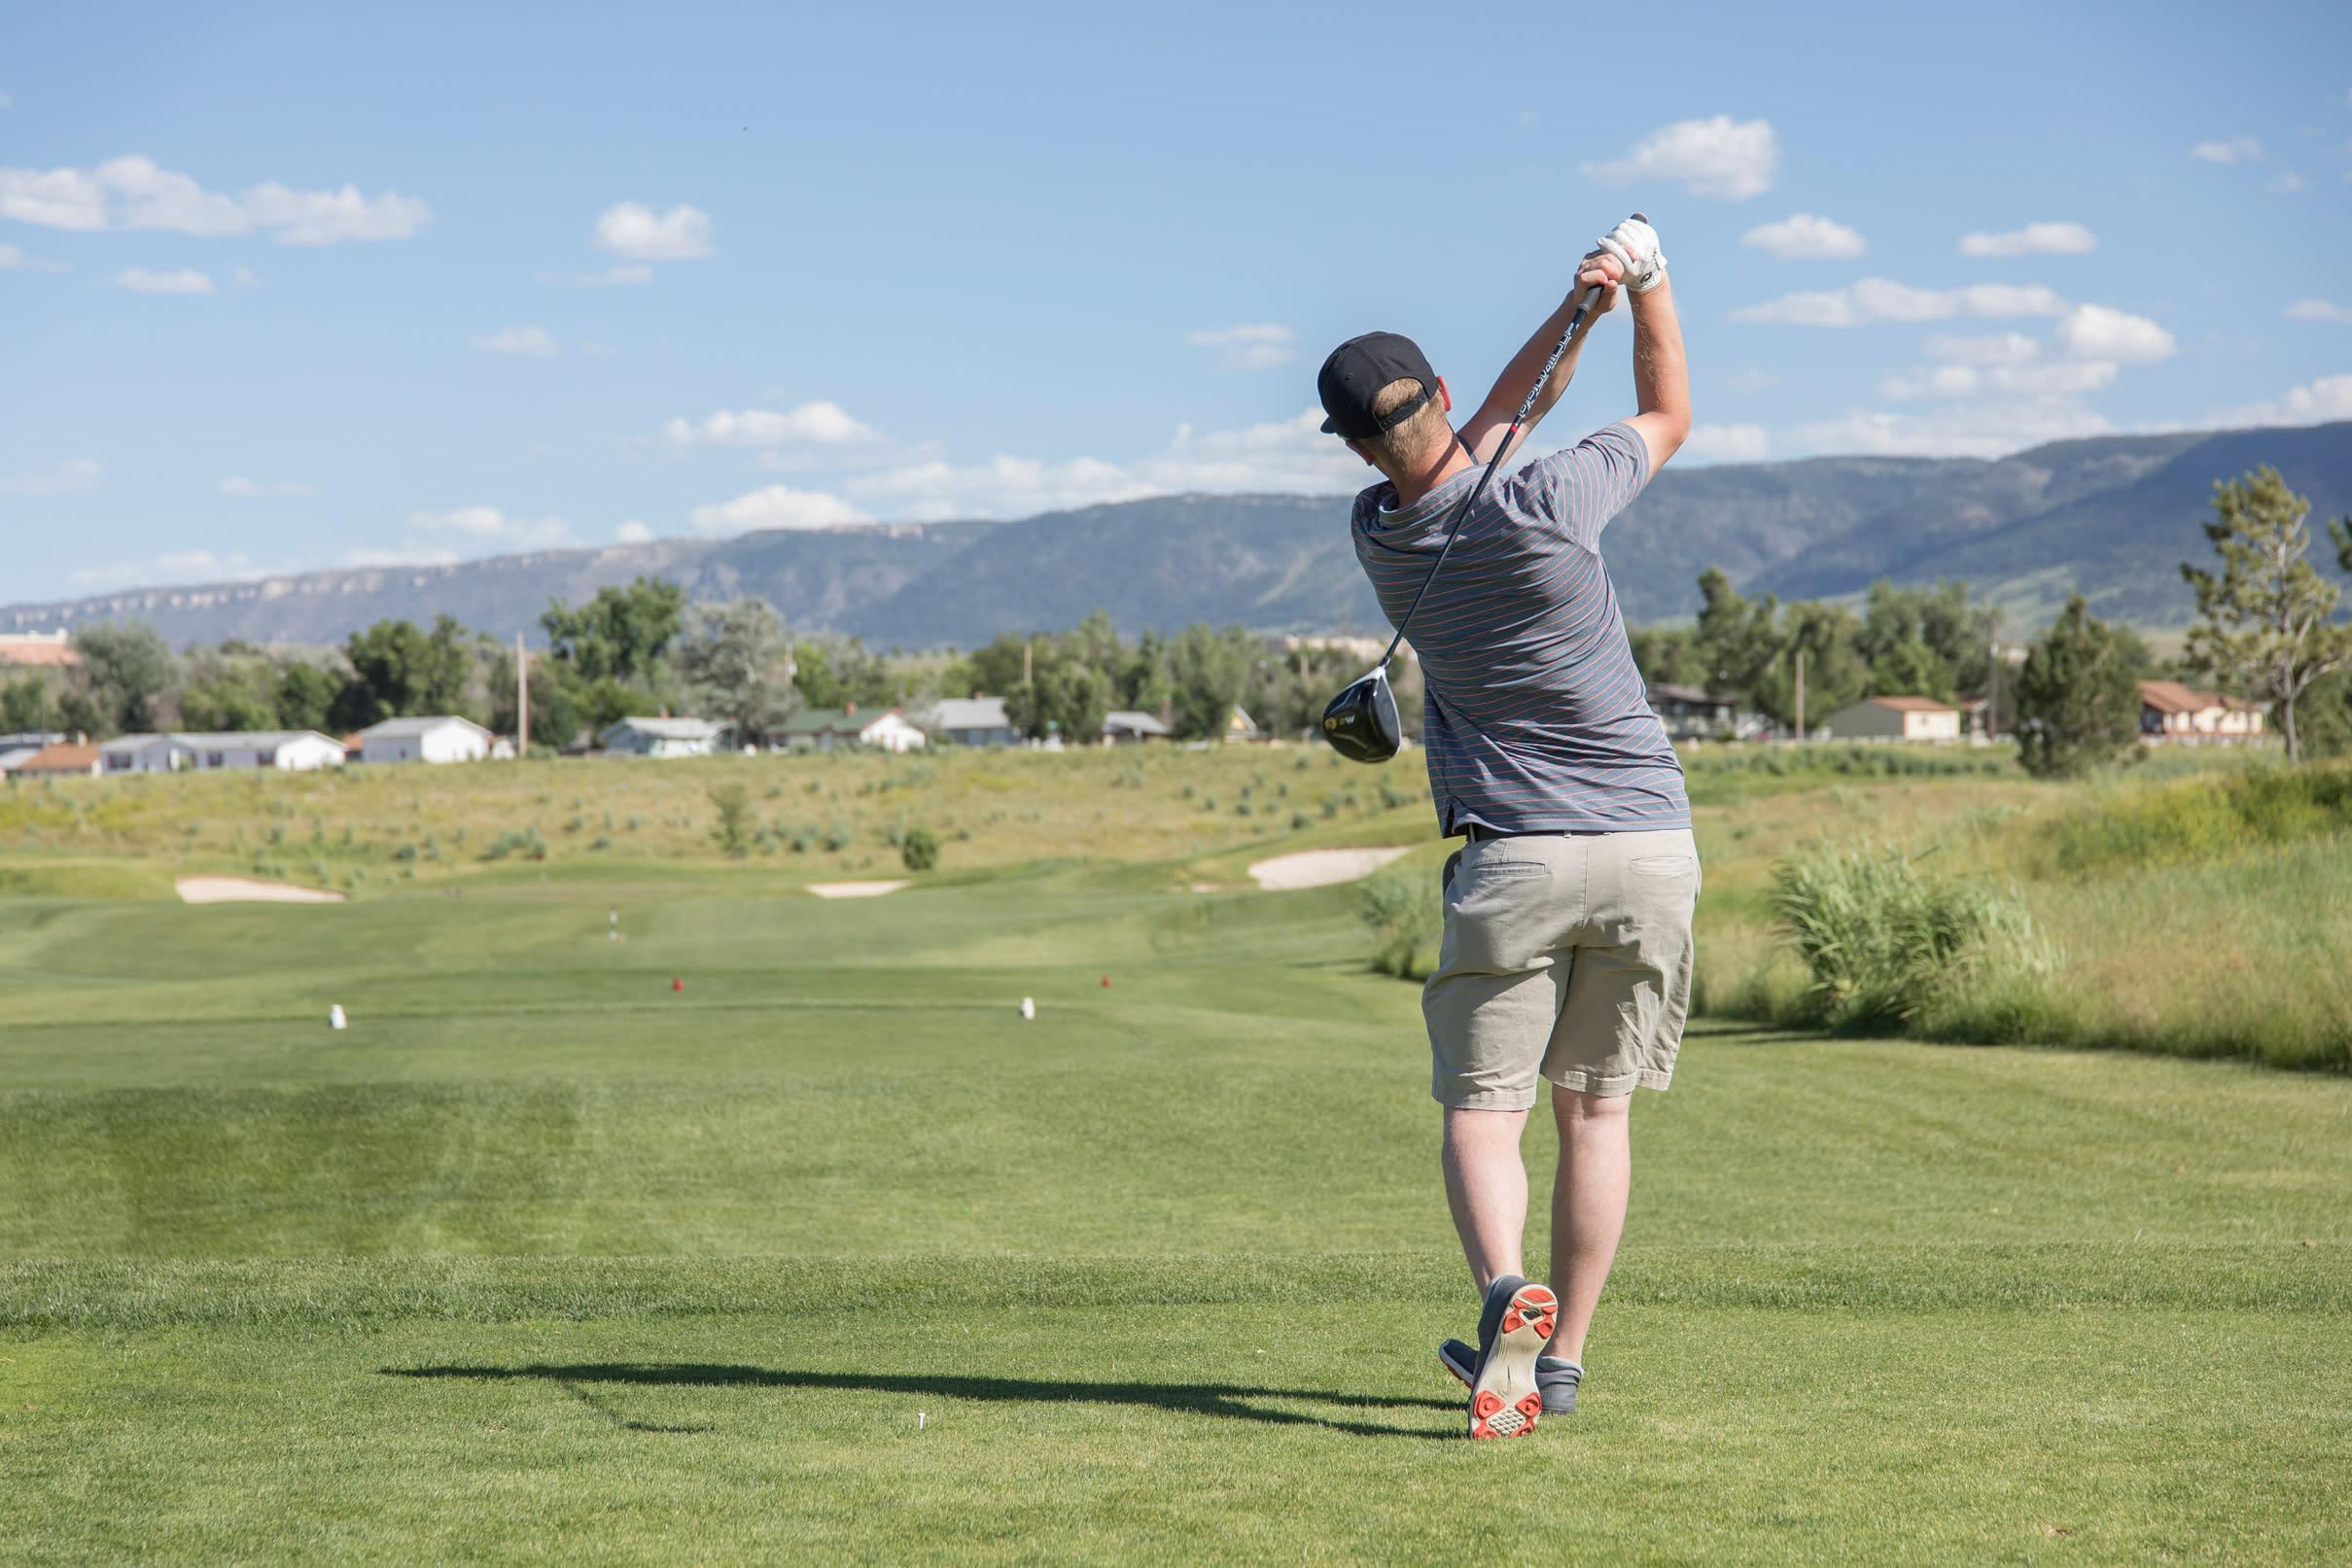 Golfing in Casper, Wyoming